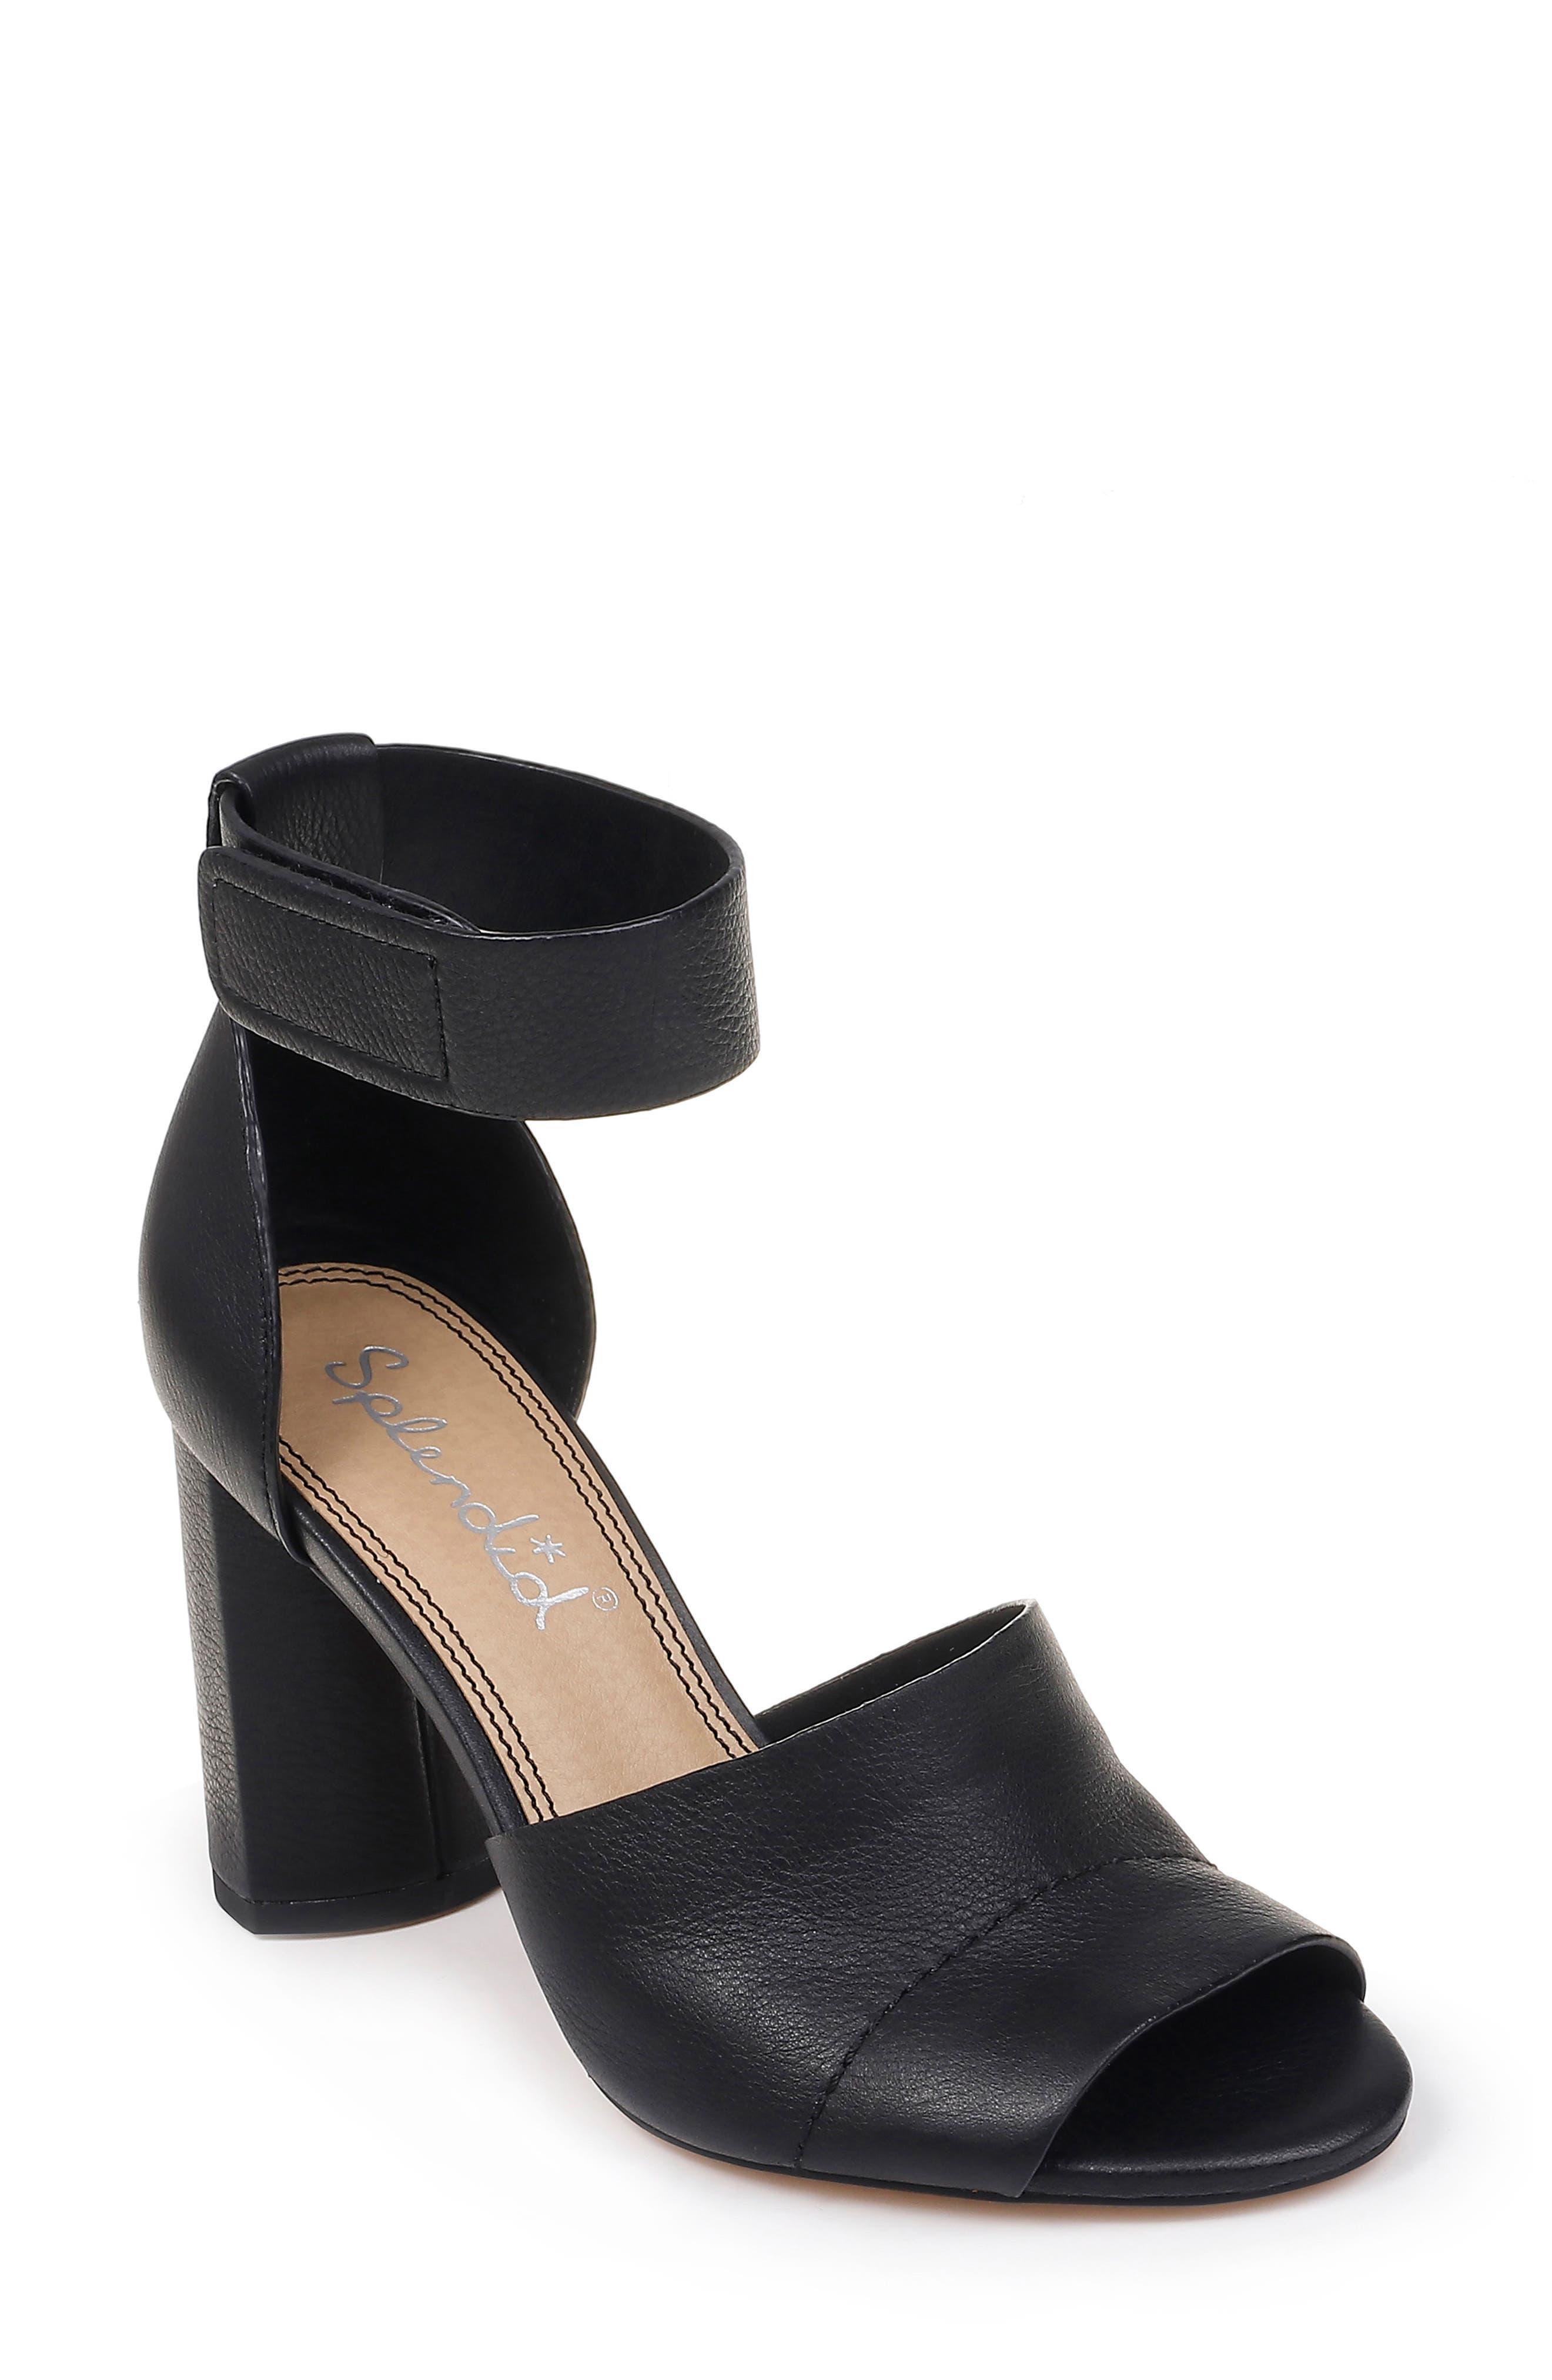 Splendid Thandie Ankle Strap Sandal- Black